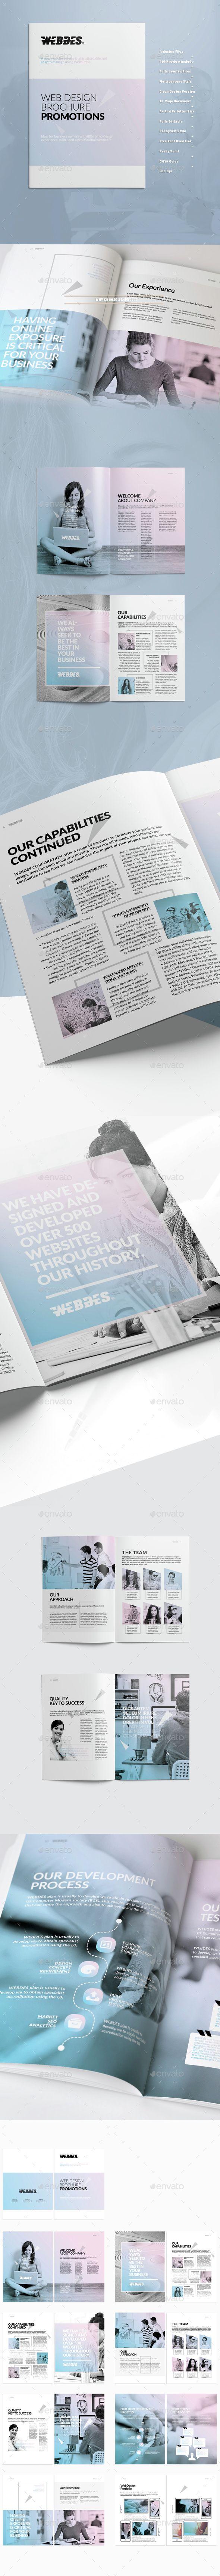 Web Design Brochure a4, brand, brief, brochure design, business, business…